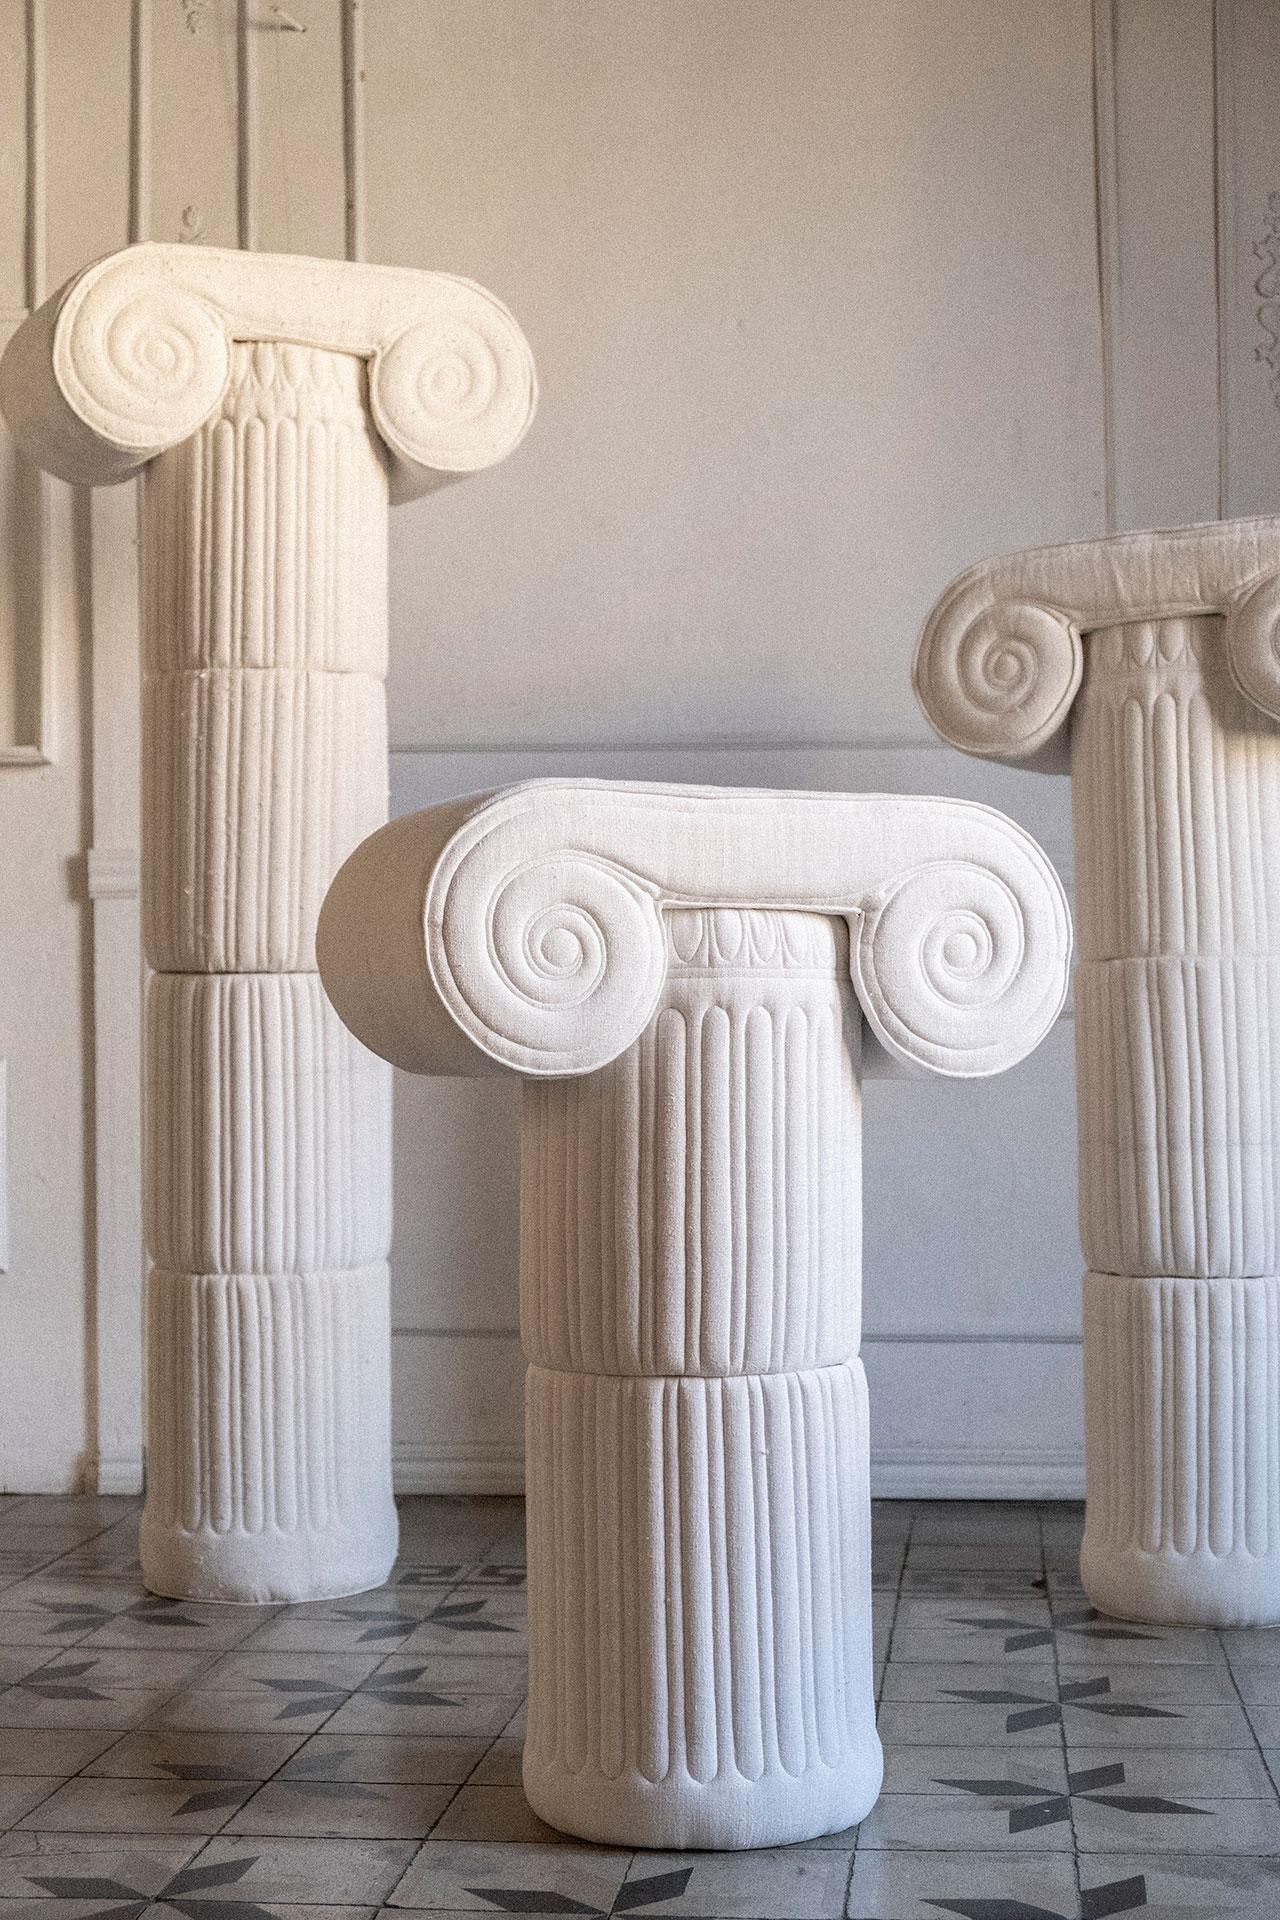 Ionic Columns. Photography © Sergio Roger.